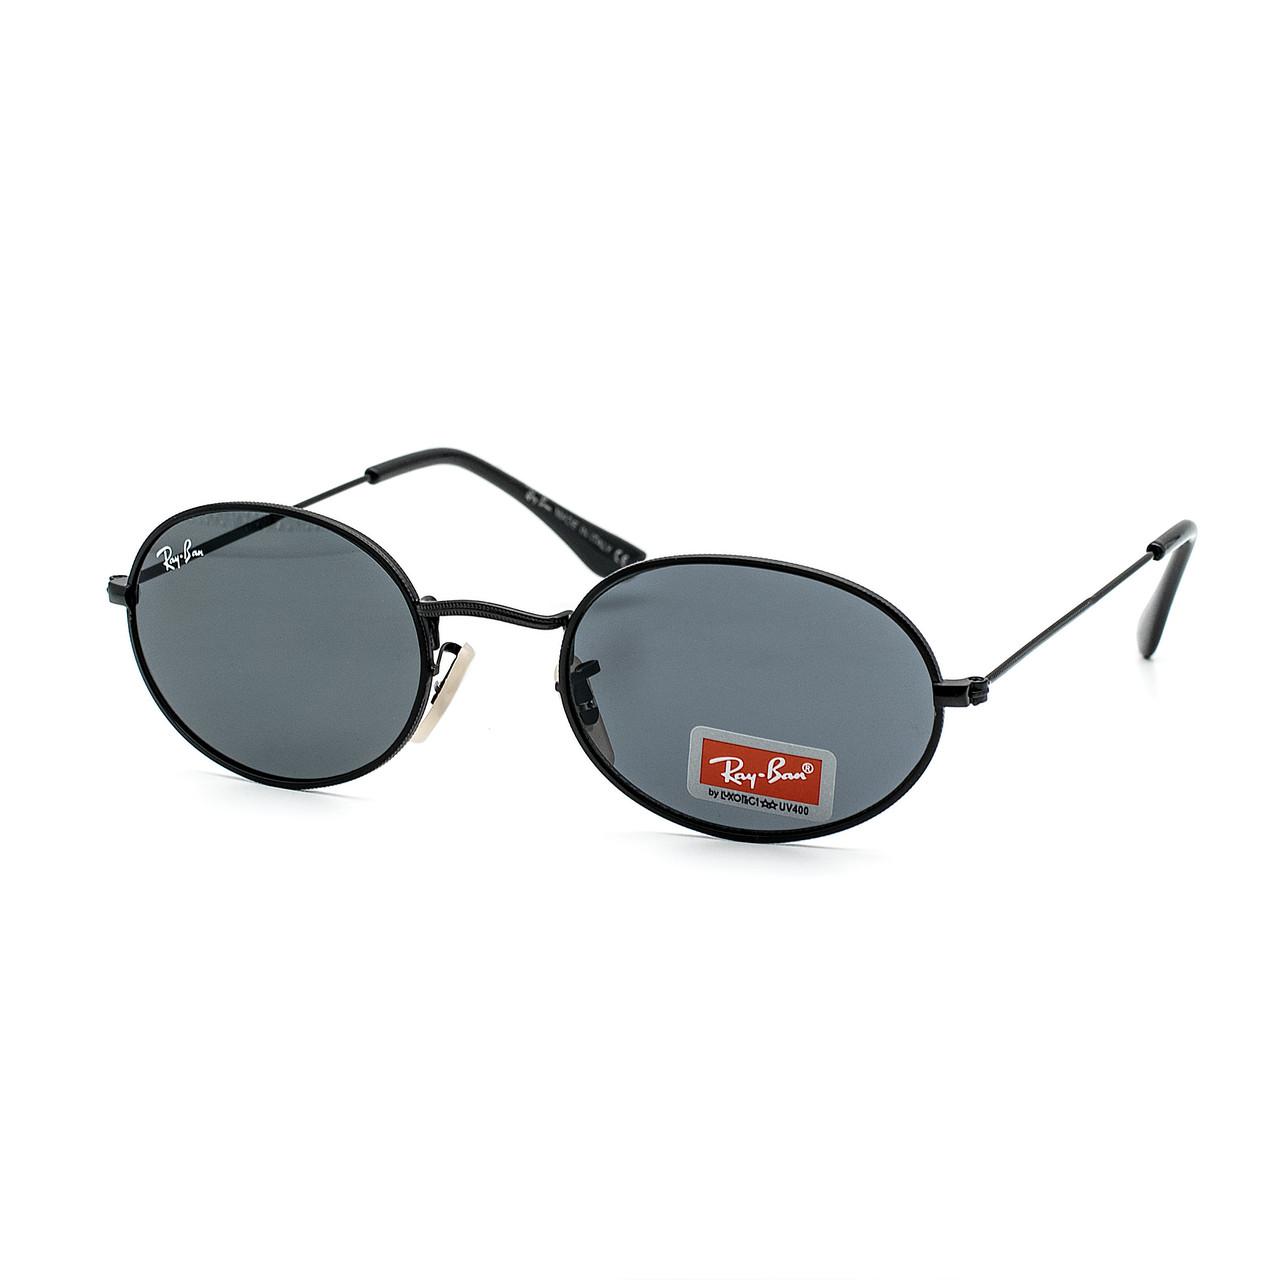 Очки Ray Ban Oval черные (replica)